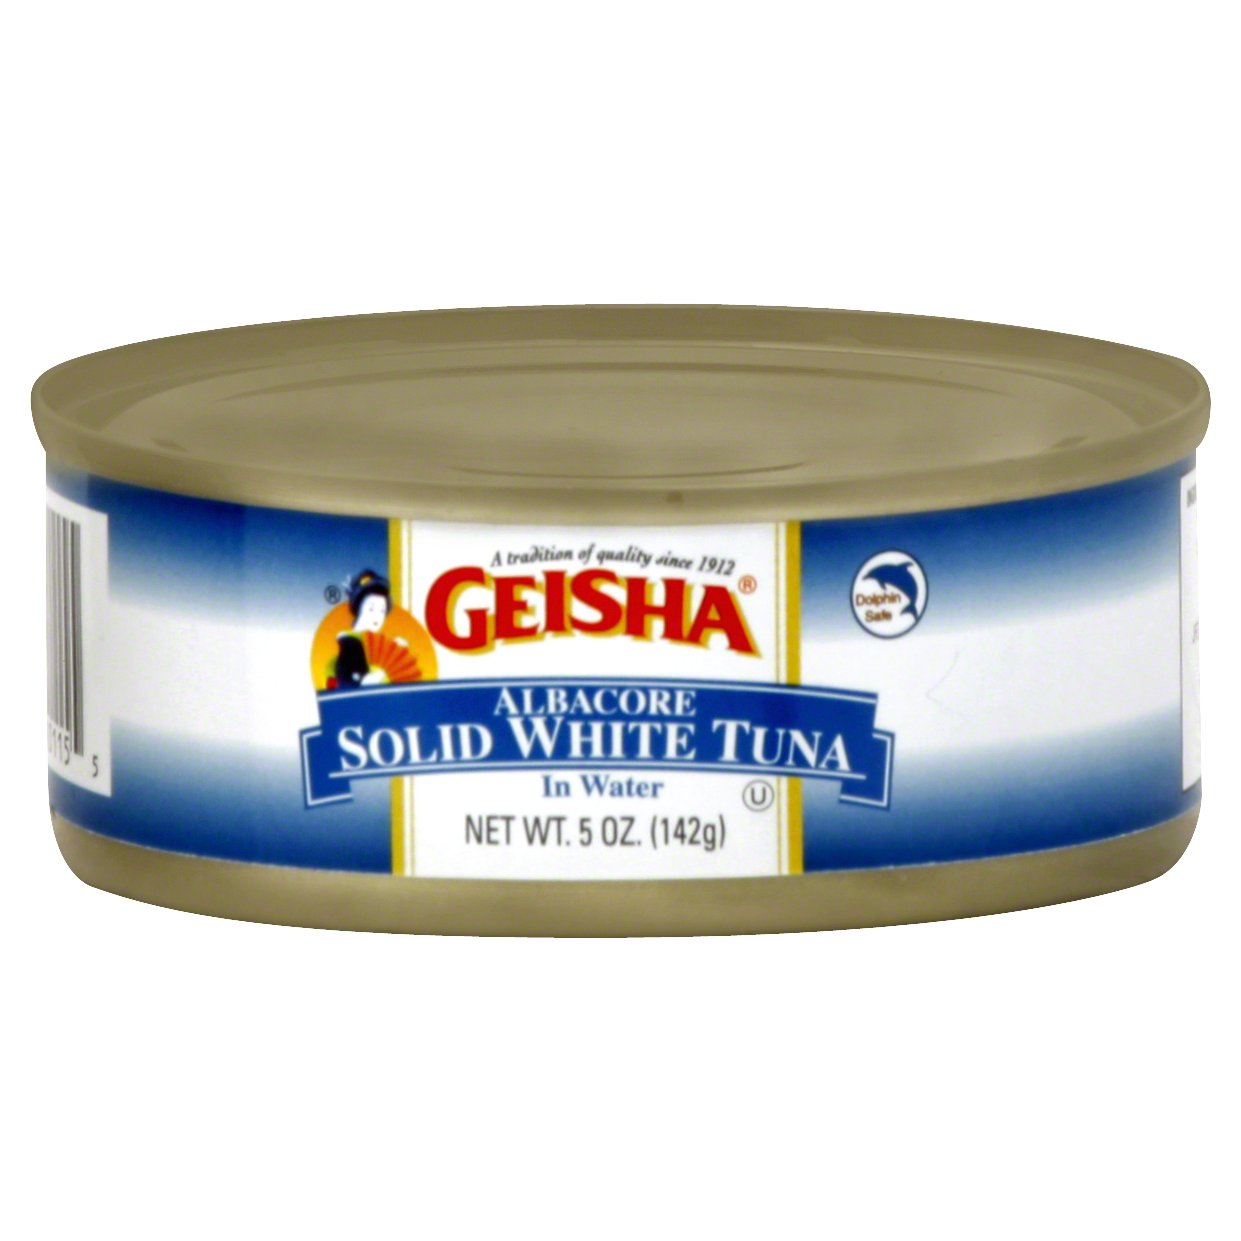 Geisha Albacore Solid White Tuna 5.0 OZ 24-Pack